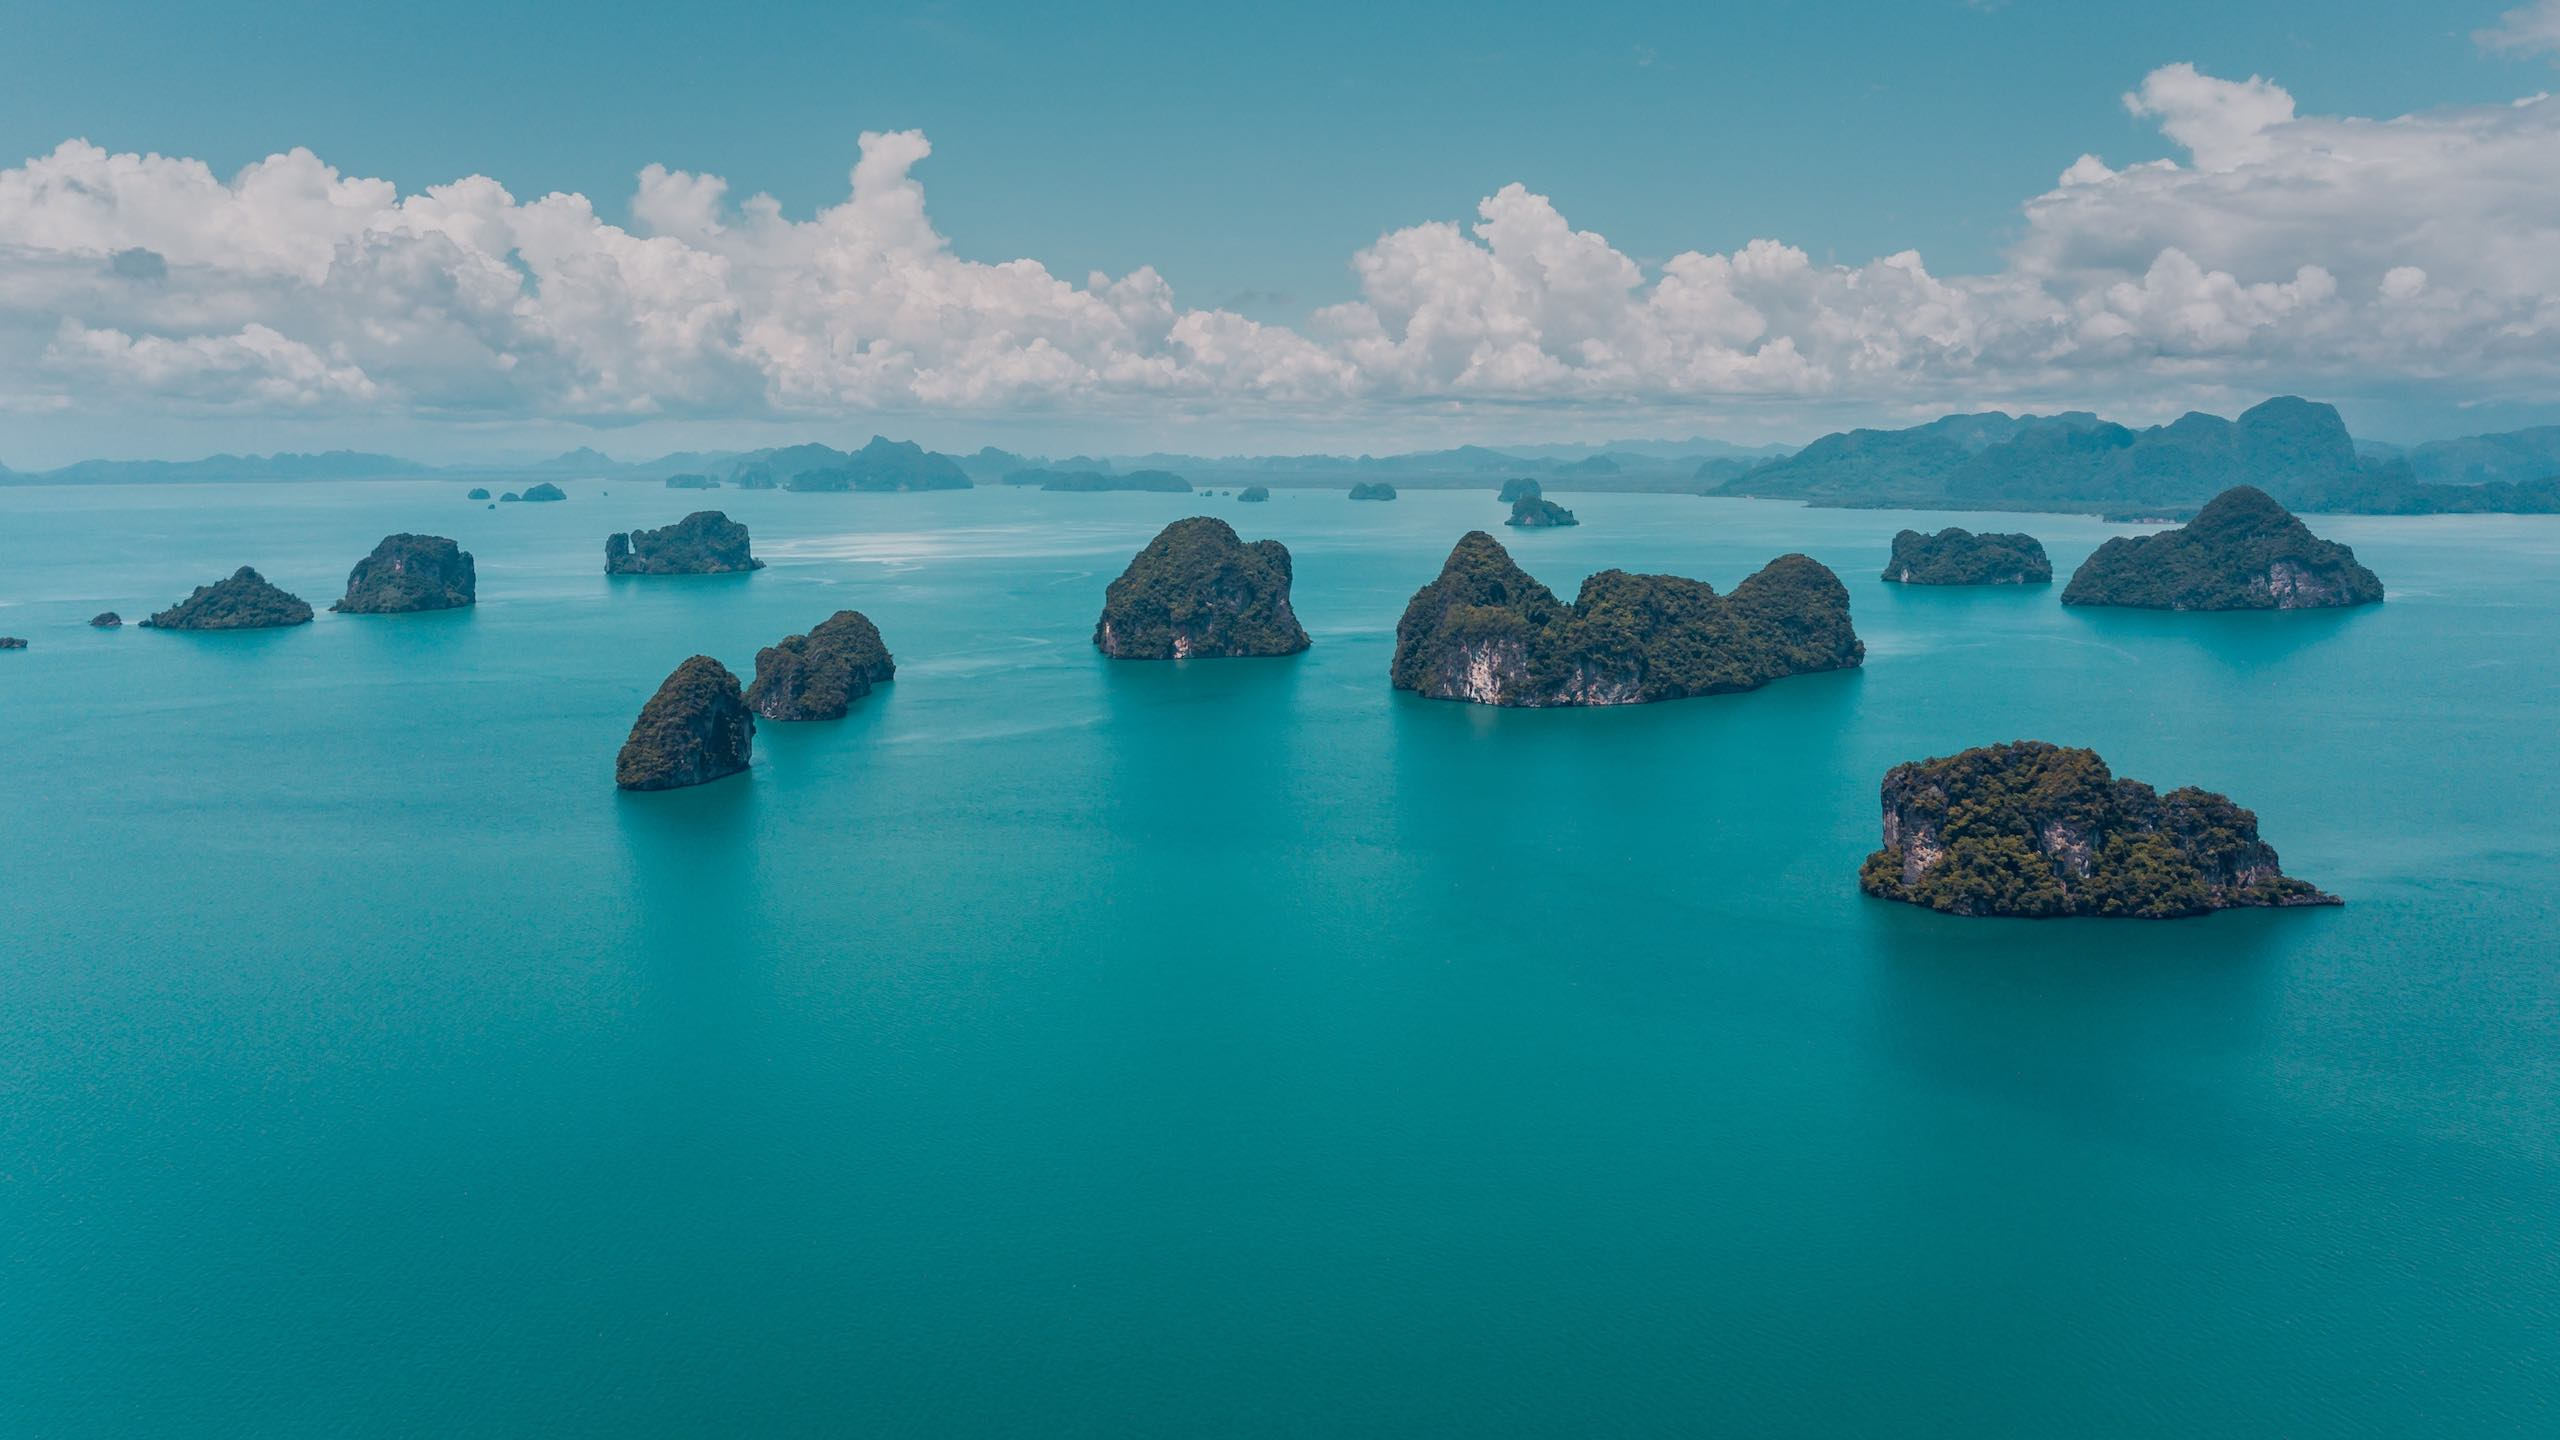 Thailand favourite place of Carlos Melia